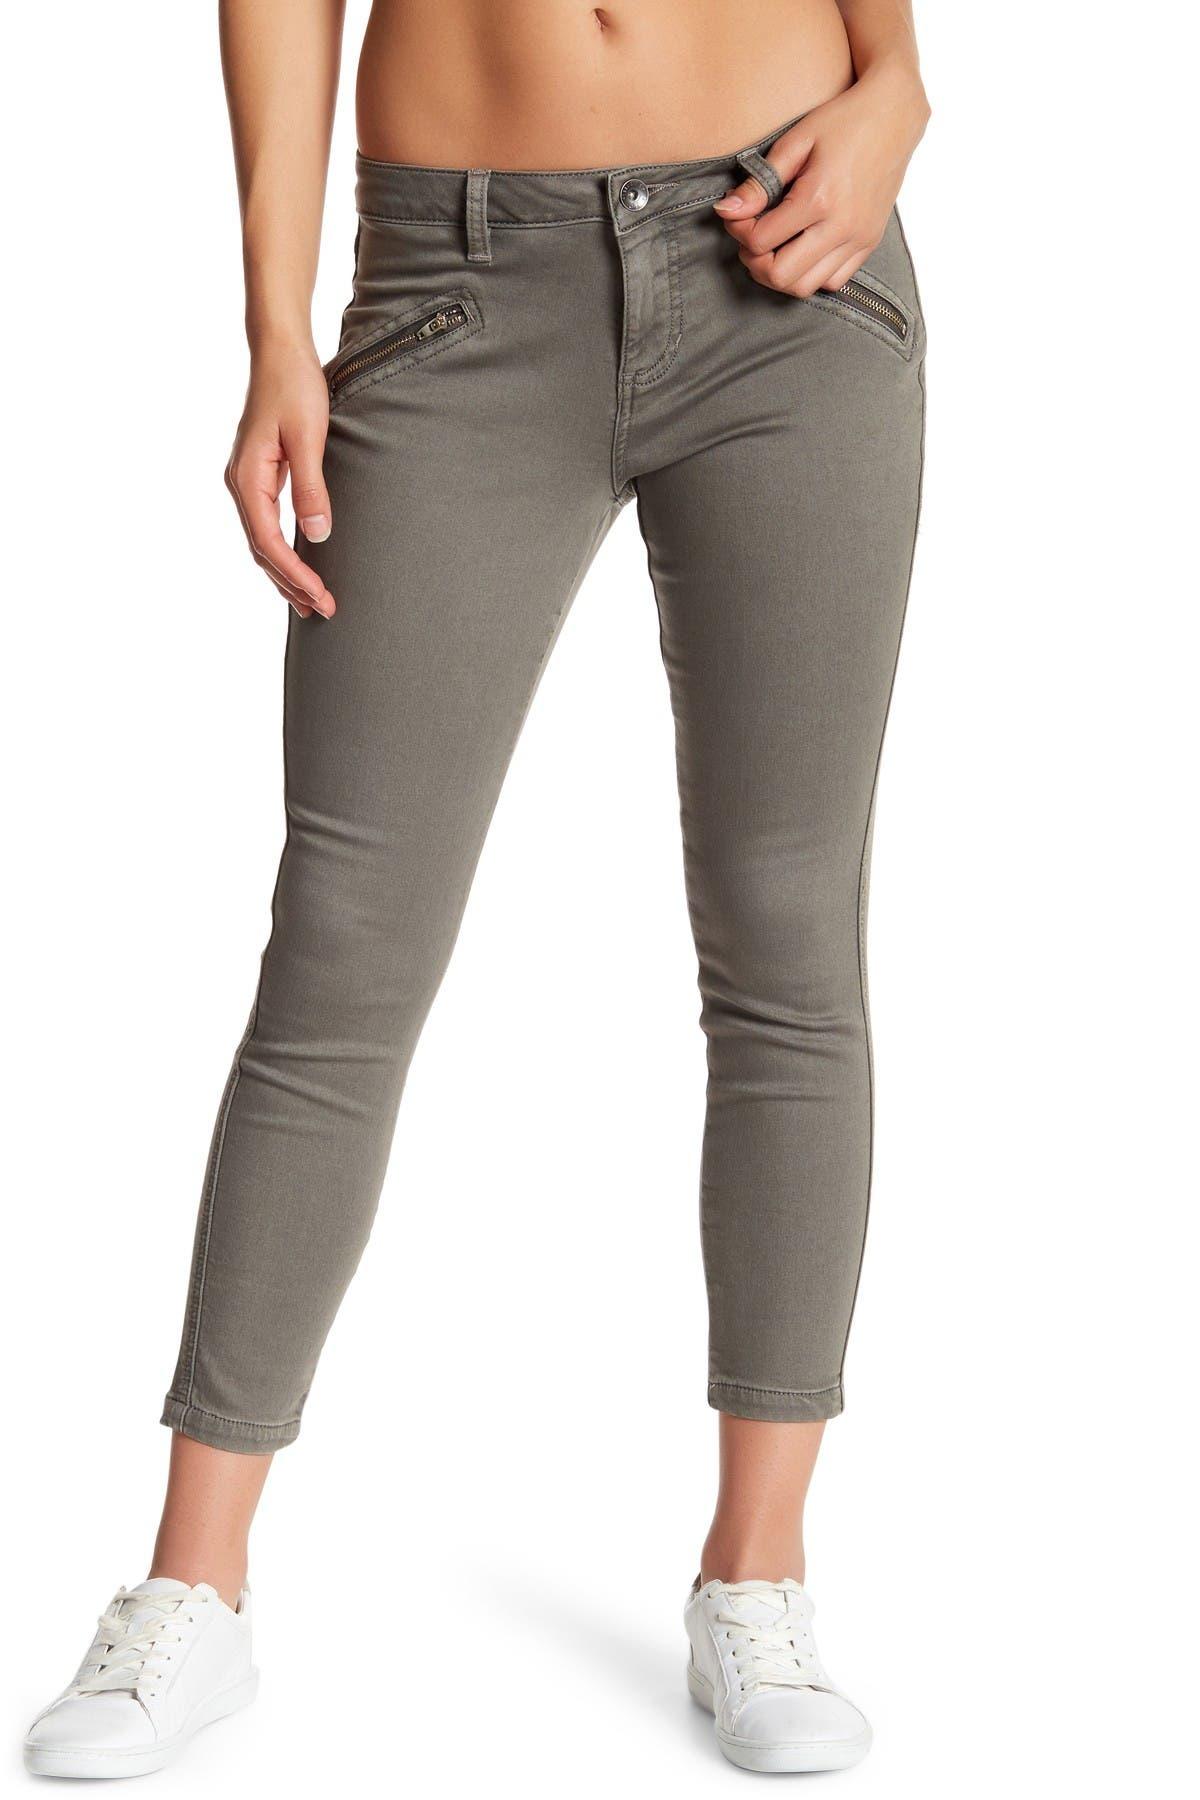 Image of JAG Jeans Ryan Zip Pocket Skinny Jeans